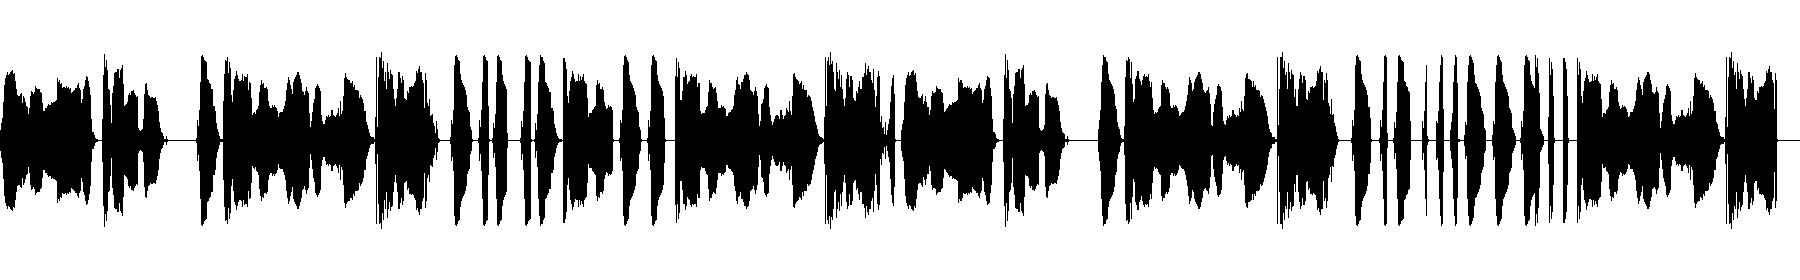 128 bpm emin vox